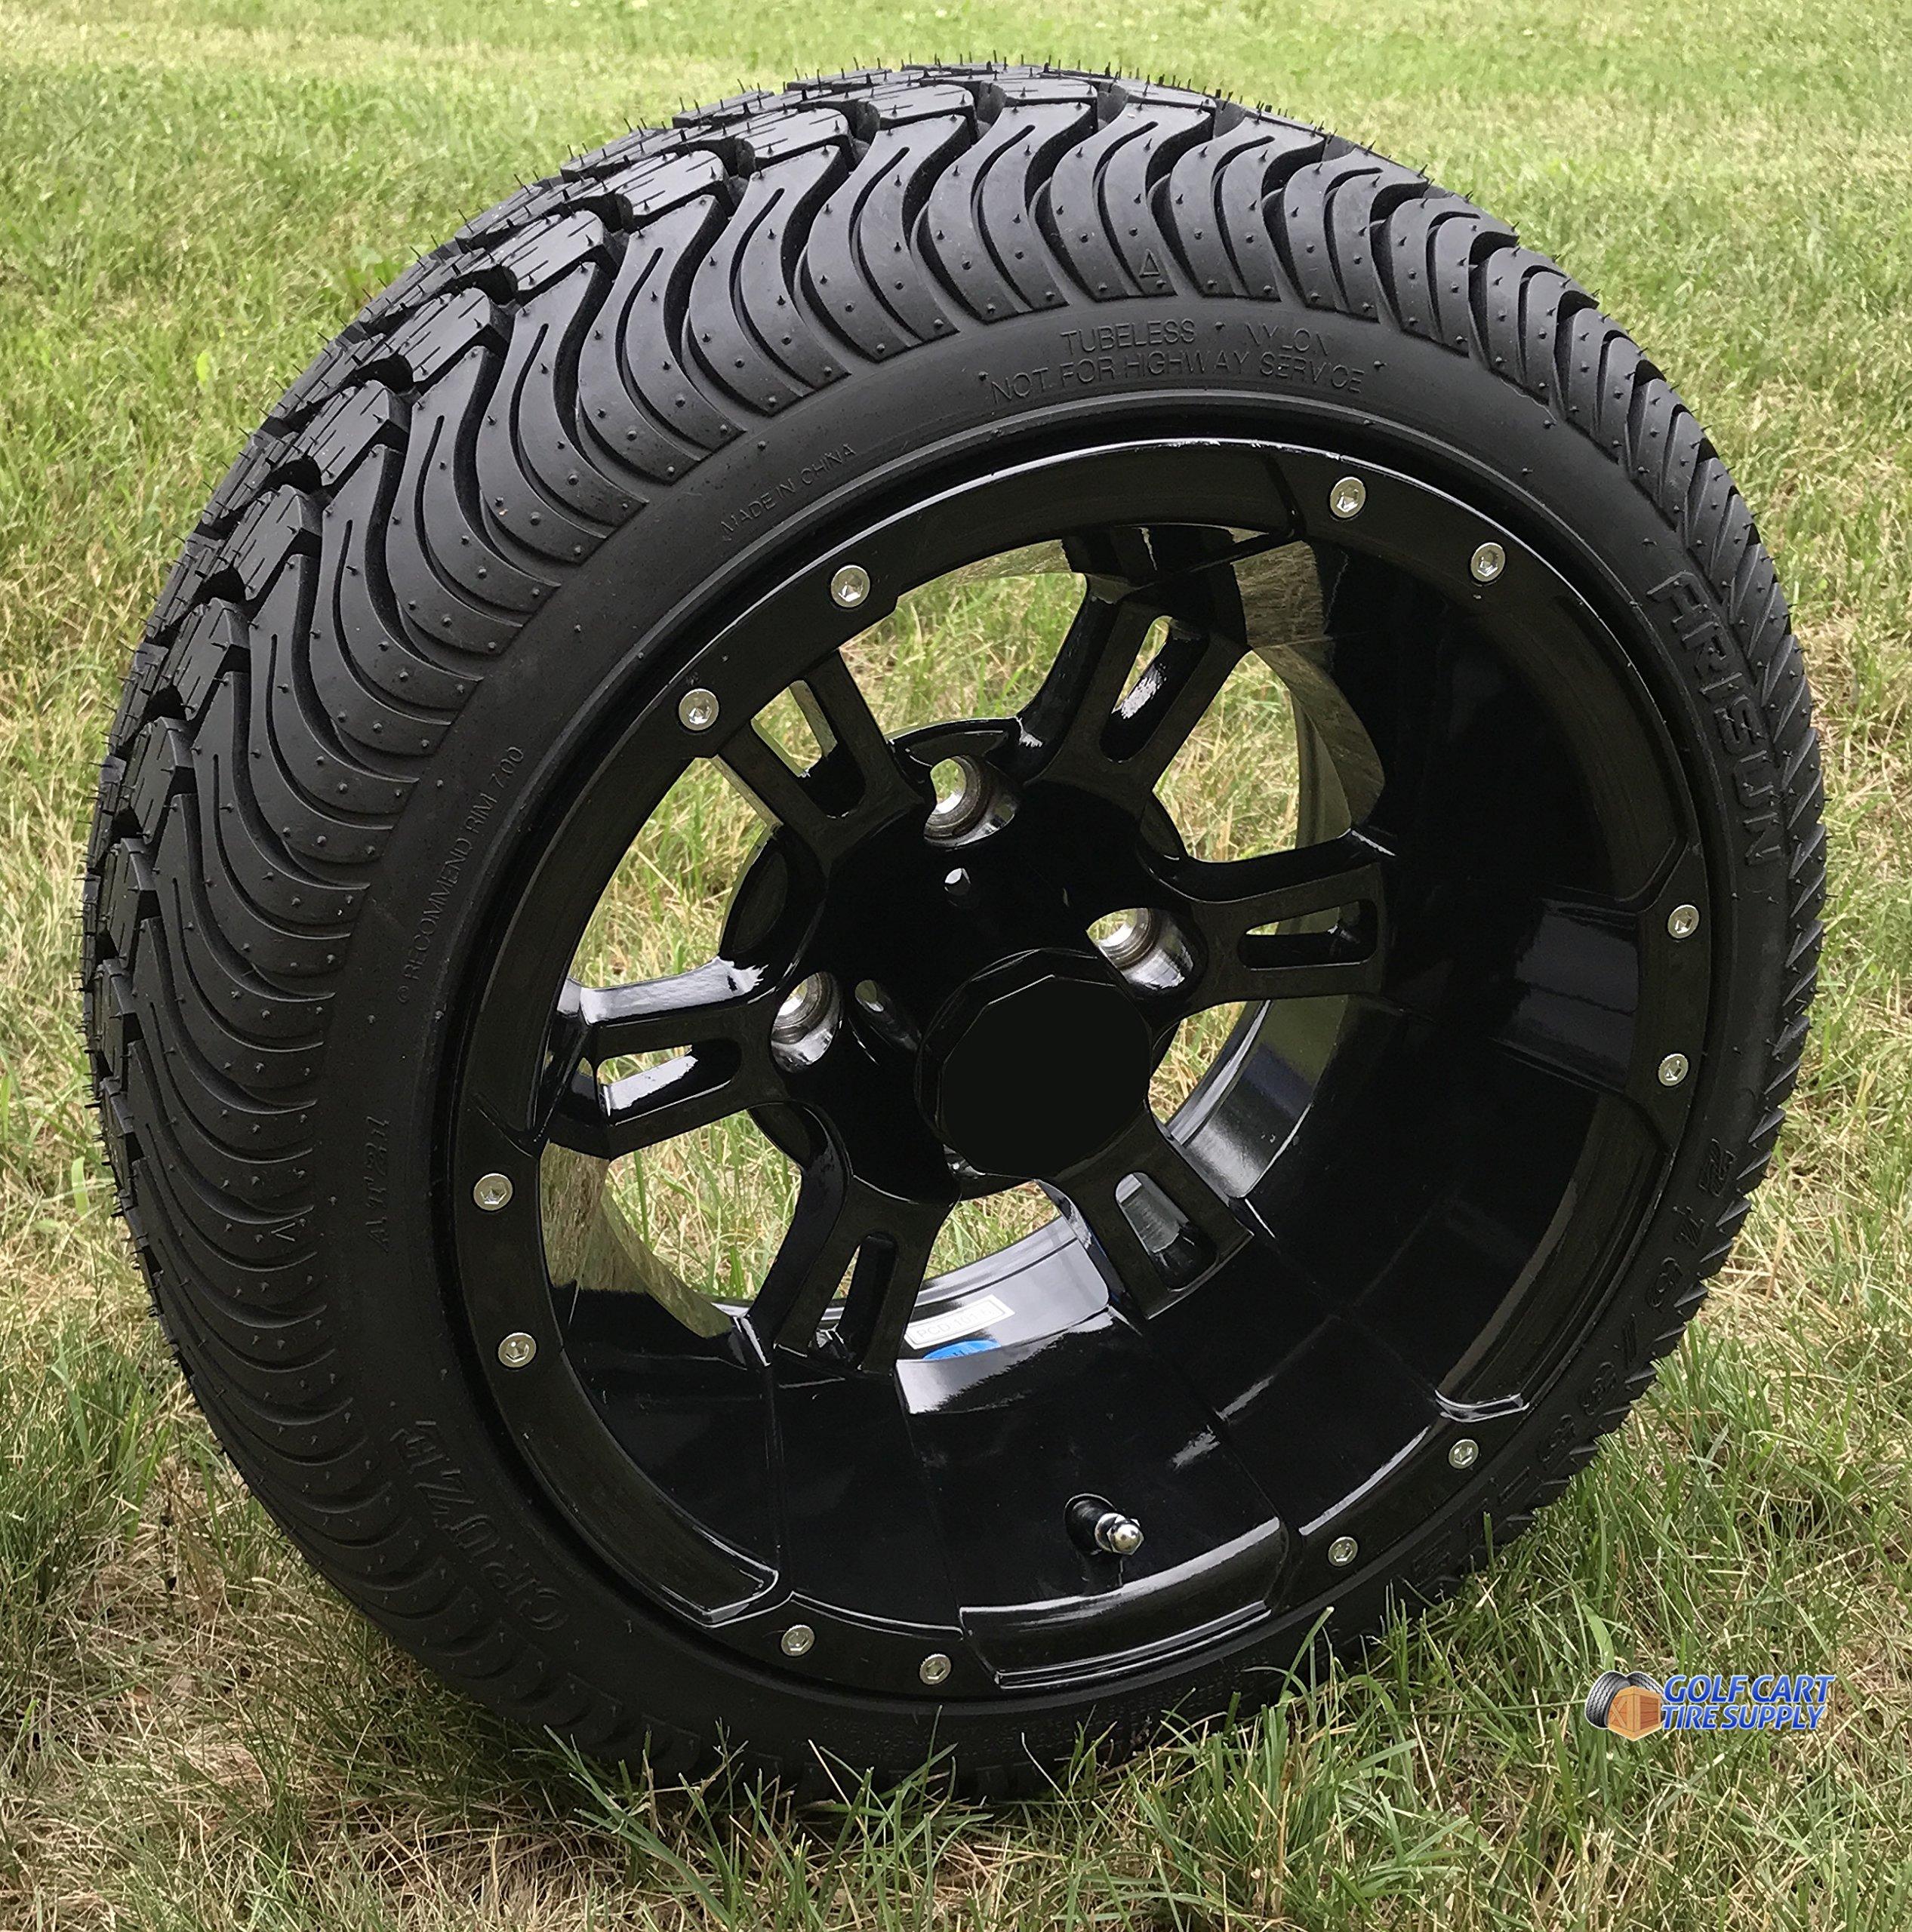 "12"" RUCKUS Gloss BLACK Wheels and 215/35-12"" DOT Low Profile Tires Combo - Set of 4 (STANDARD LUGS 1/2x20 (EZGO, Club Car))"